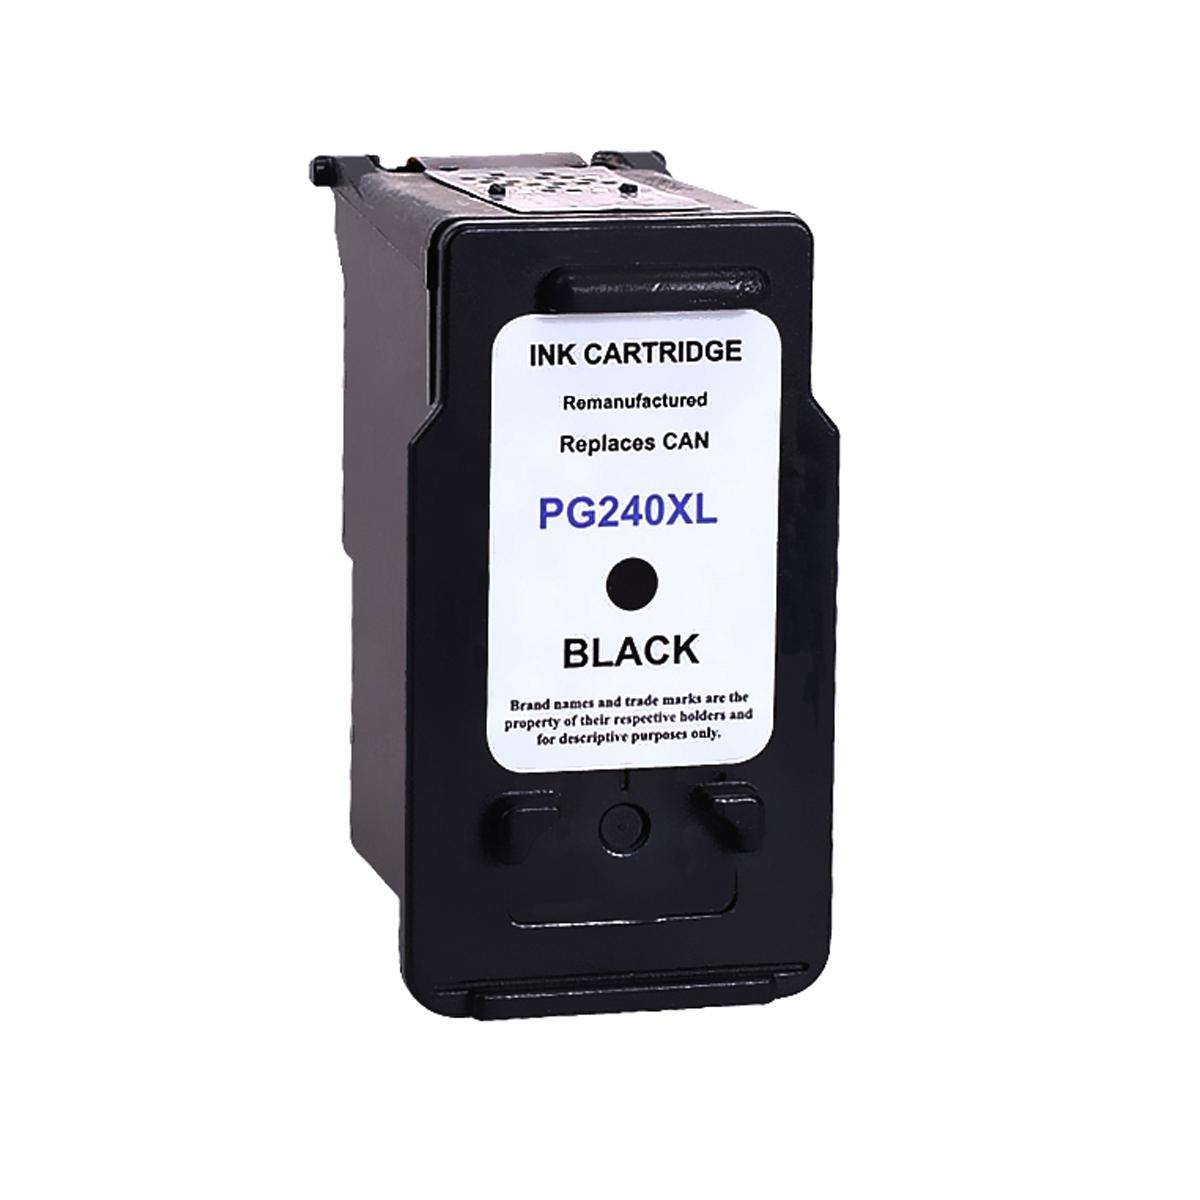 Epson Remote Control Genuine 935W X9 EB-456i 1260 EX5200 VS200 1835 EB-460 OEM